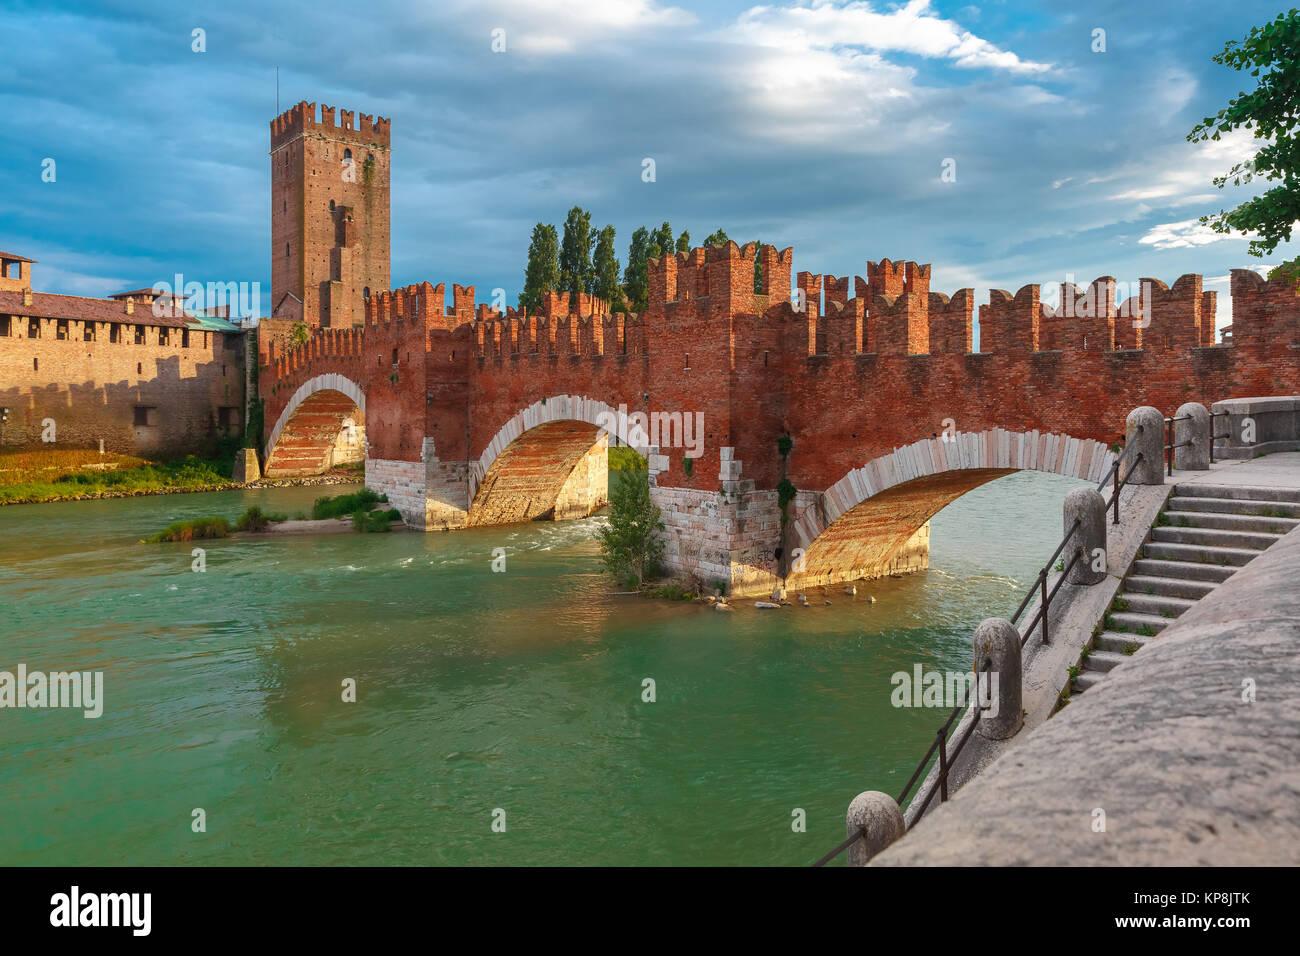 Castelvecchio at sunset in Verona, Italy. Stock Photo